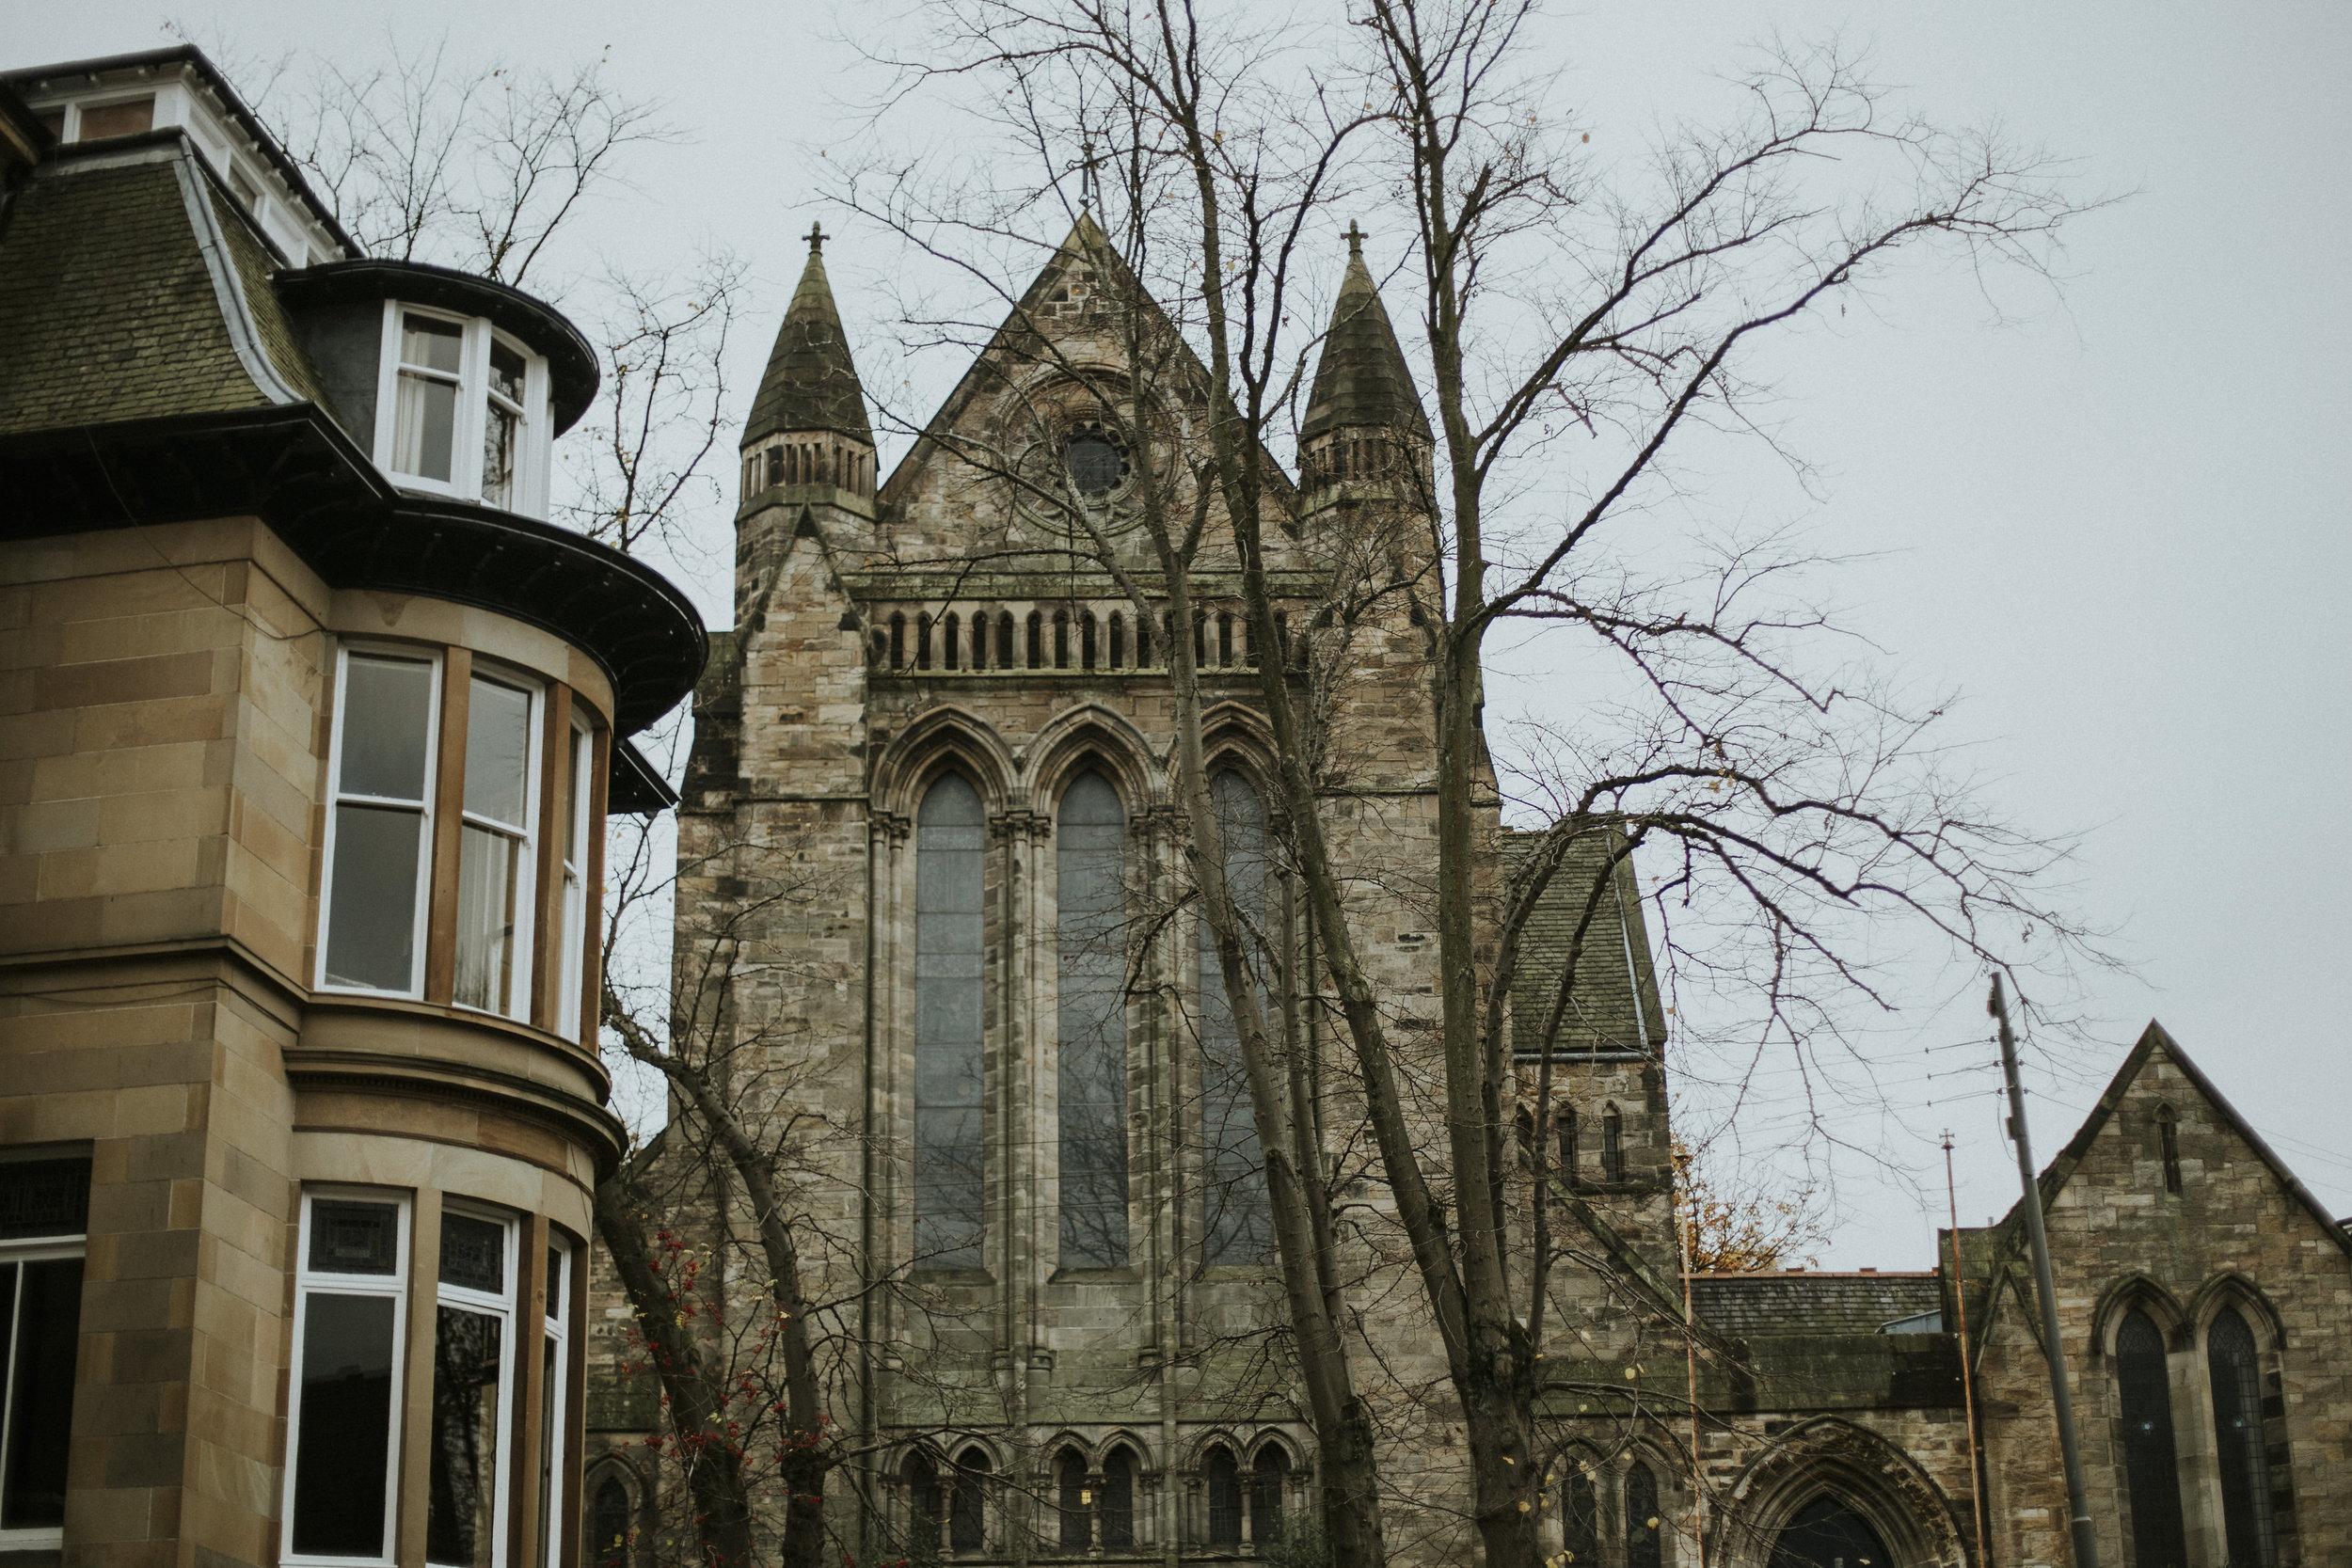 002_greek_orthodox_cathedral_scotland.jpg